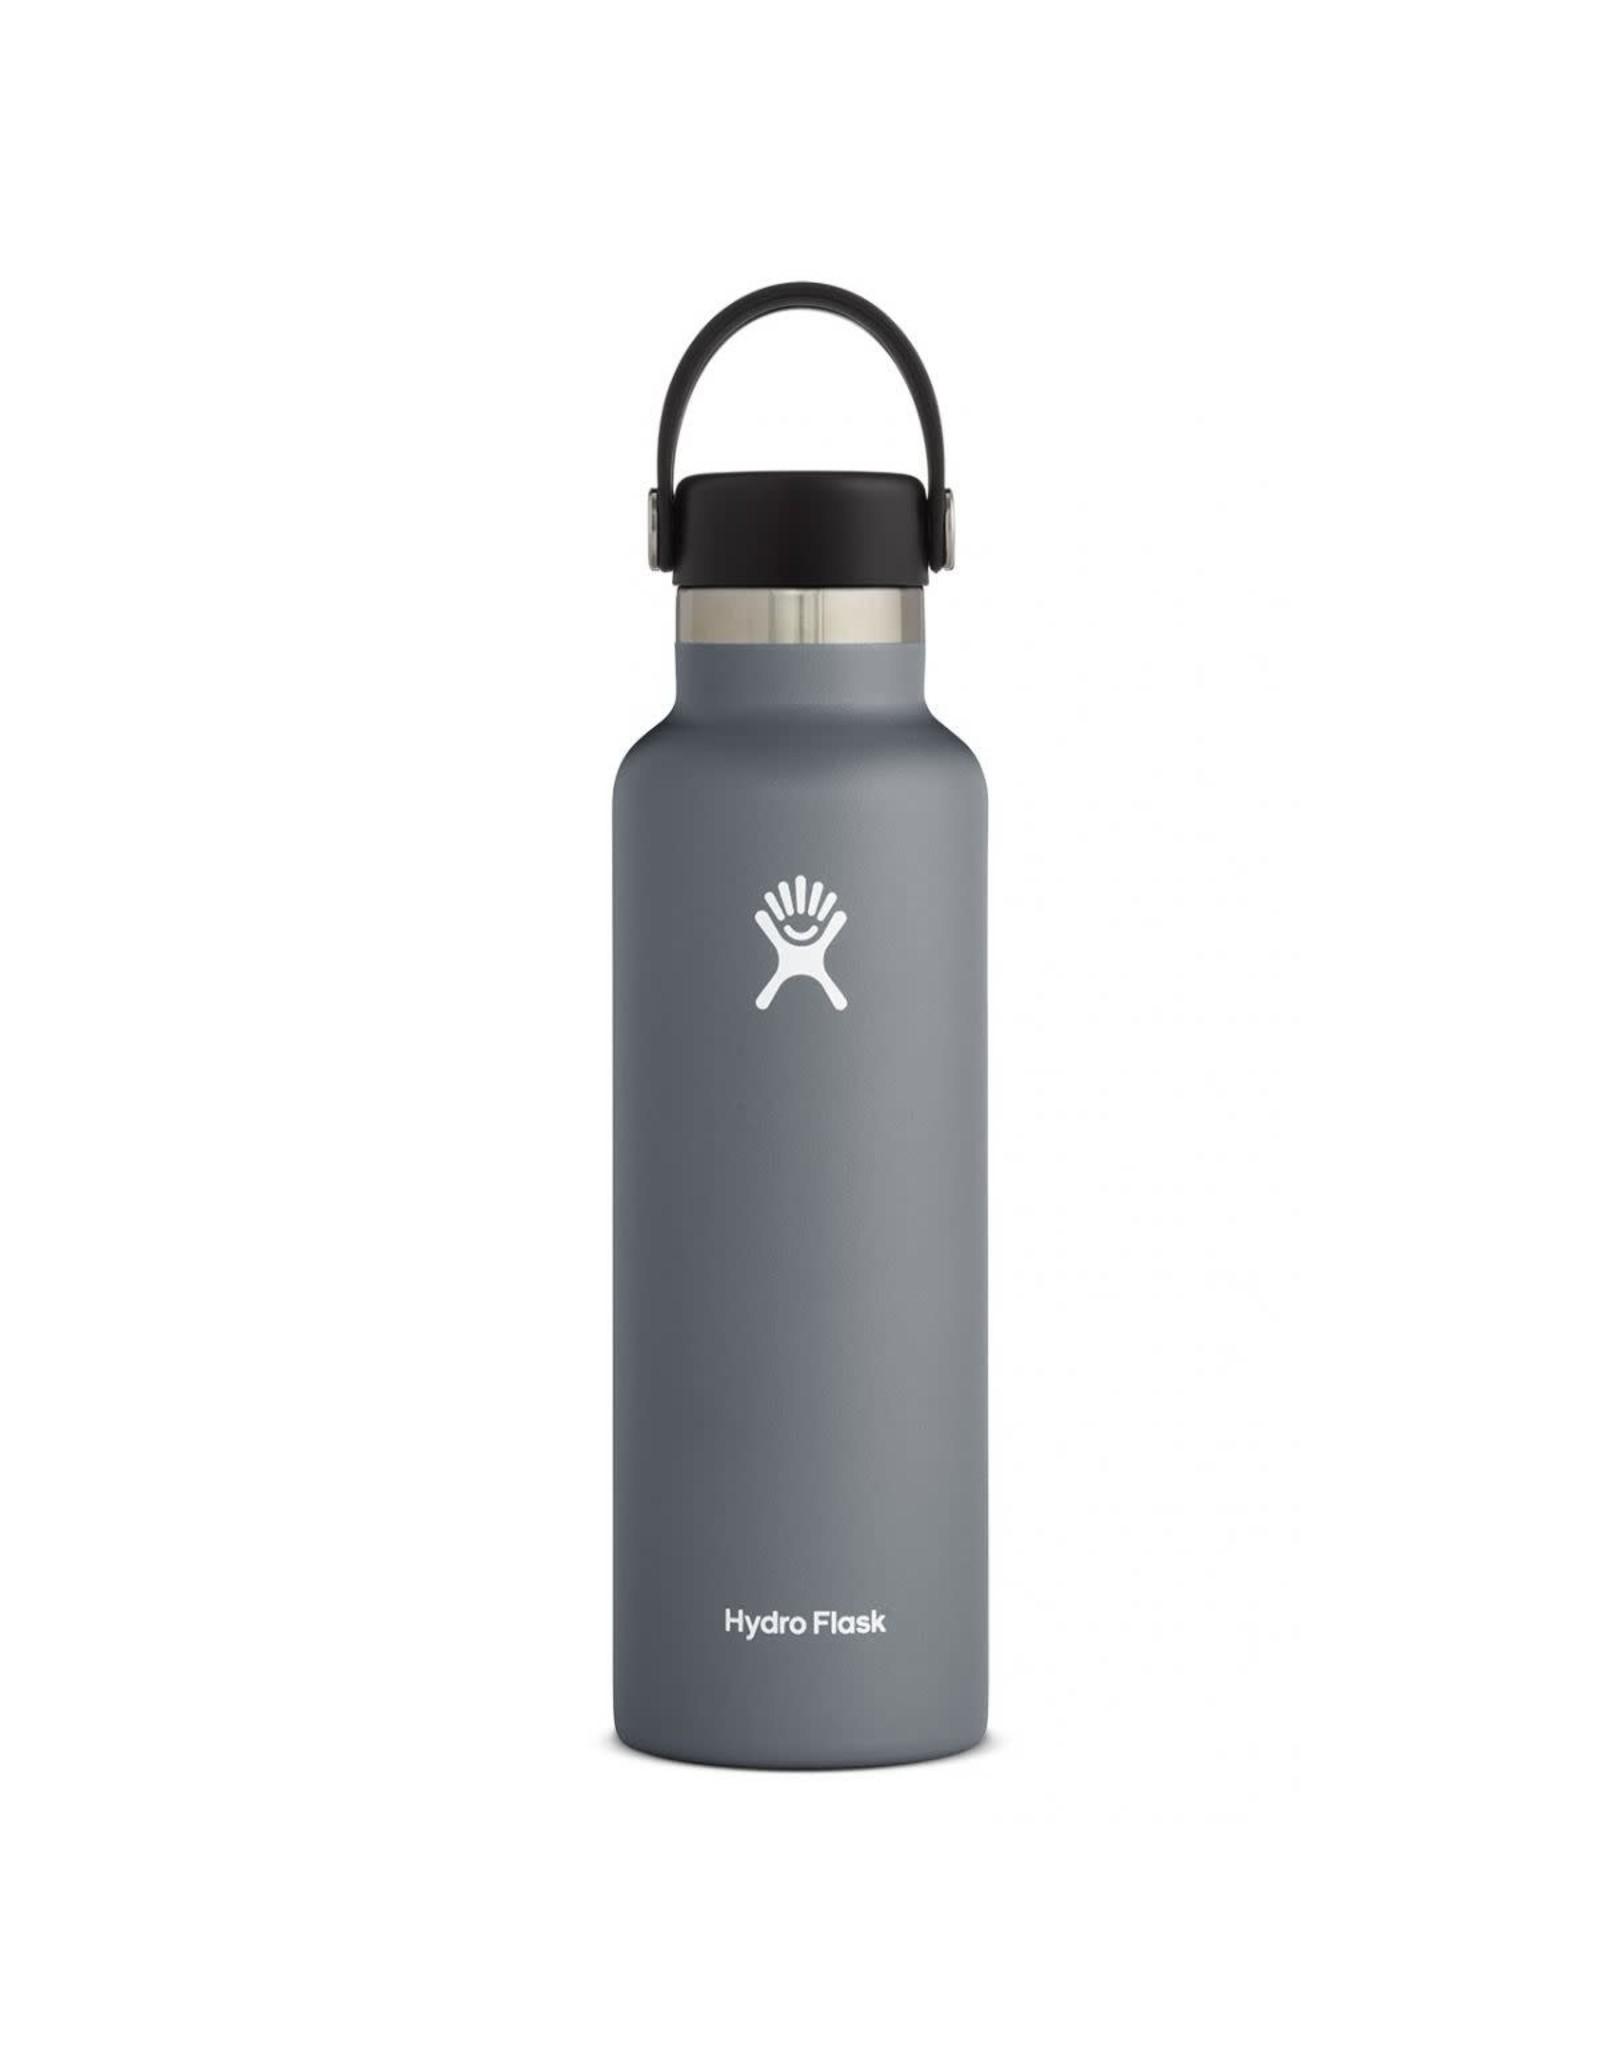 Hydro Flask Hydro Flask 21oz Standard Mouth Stone